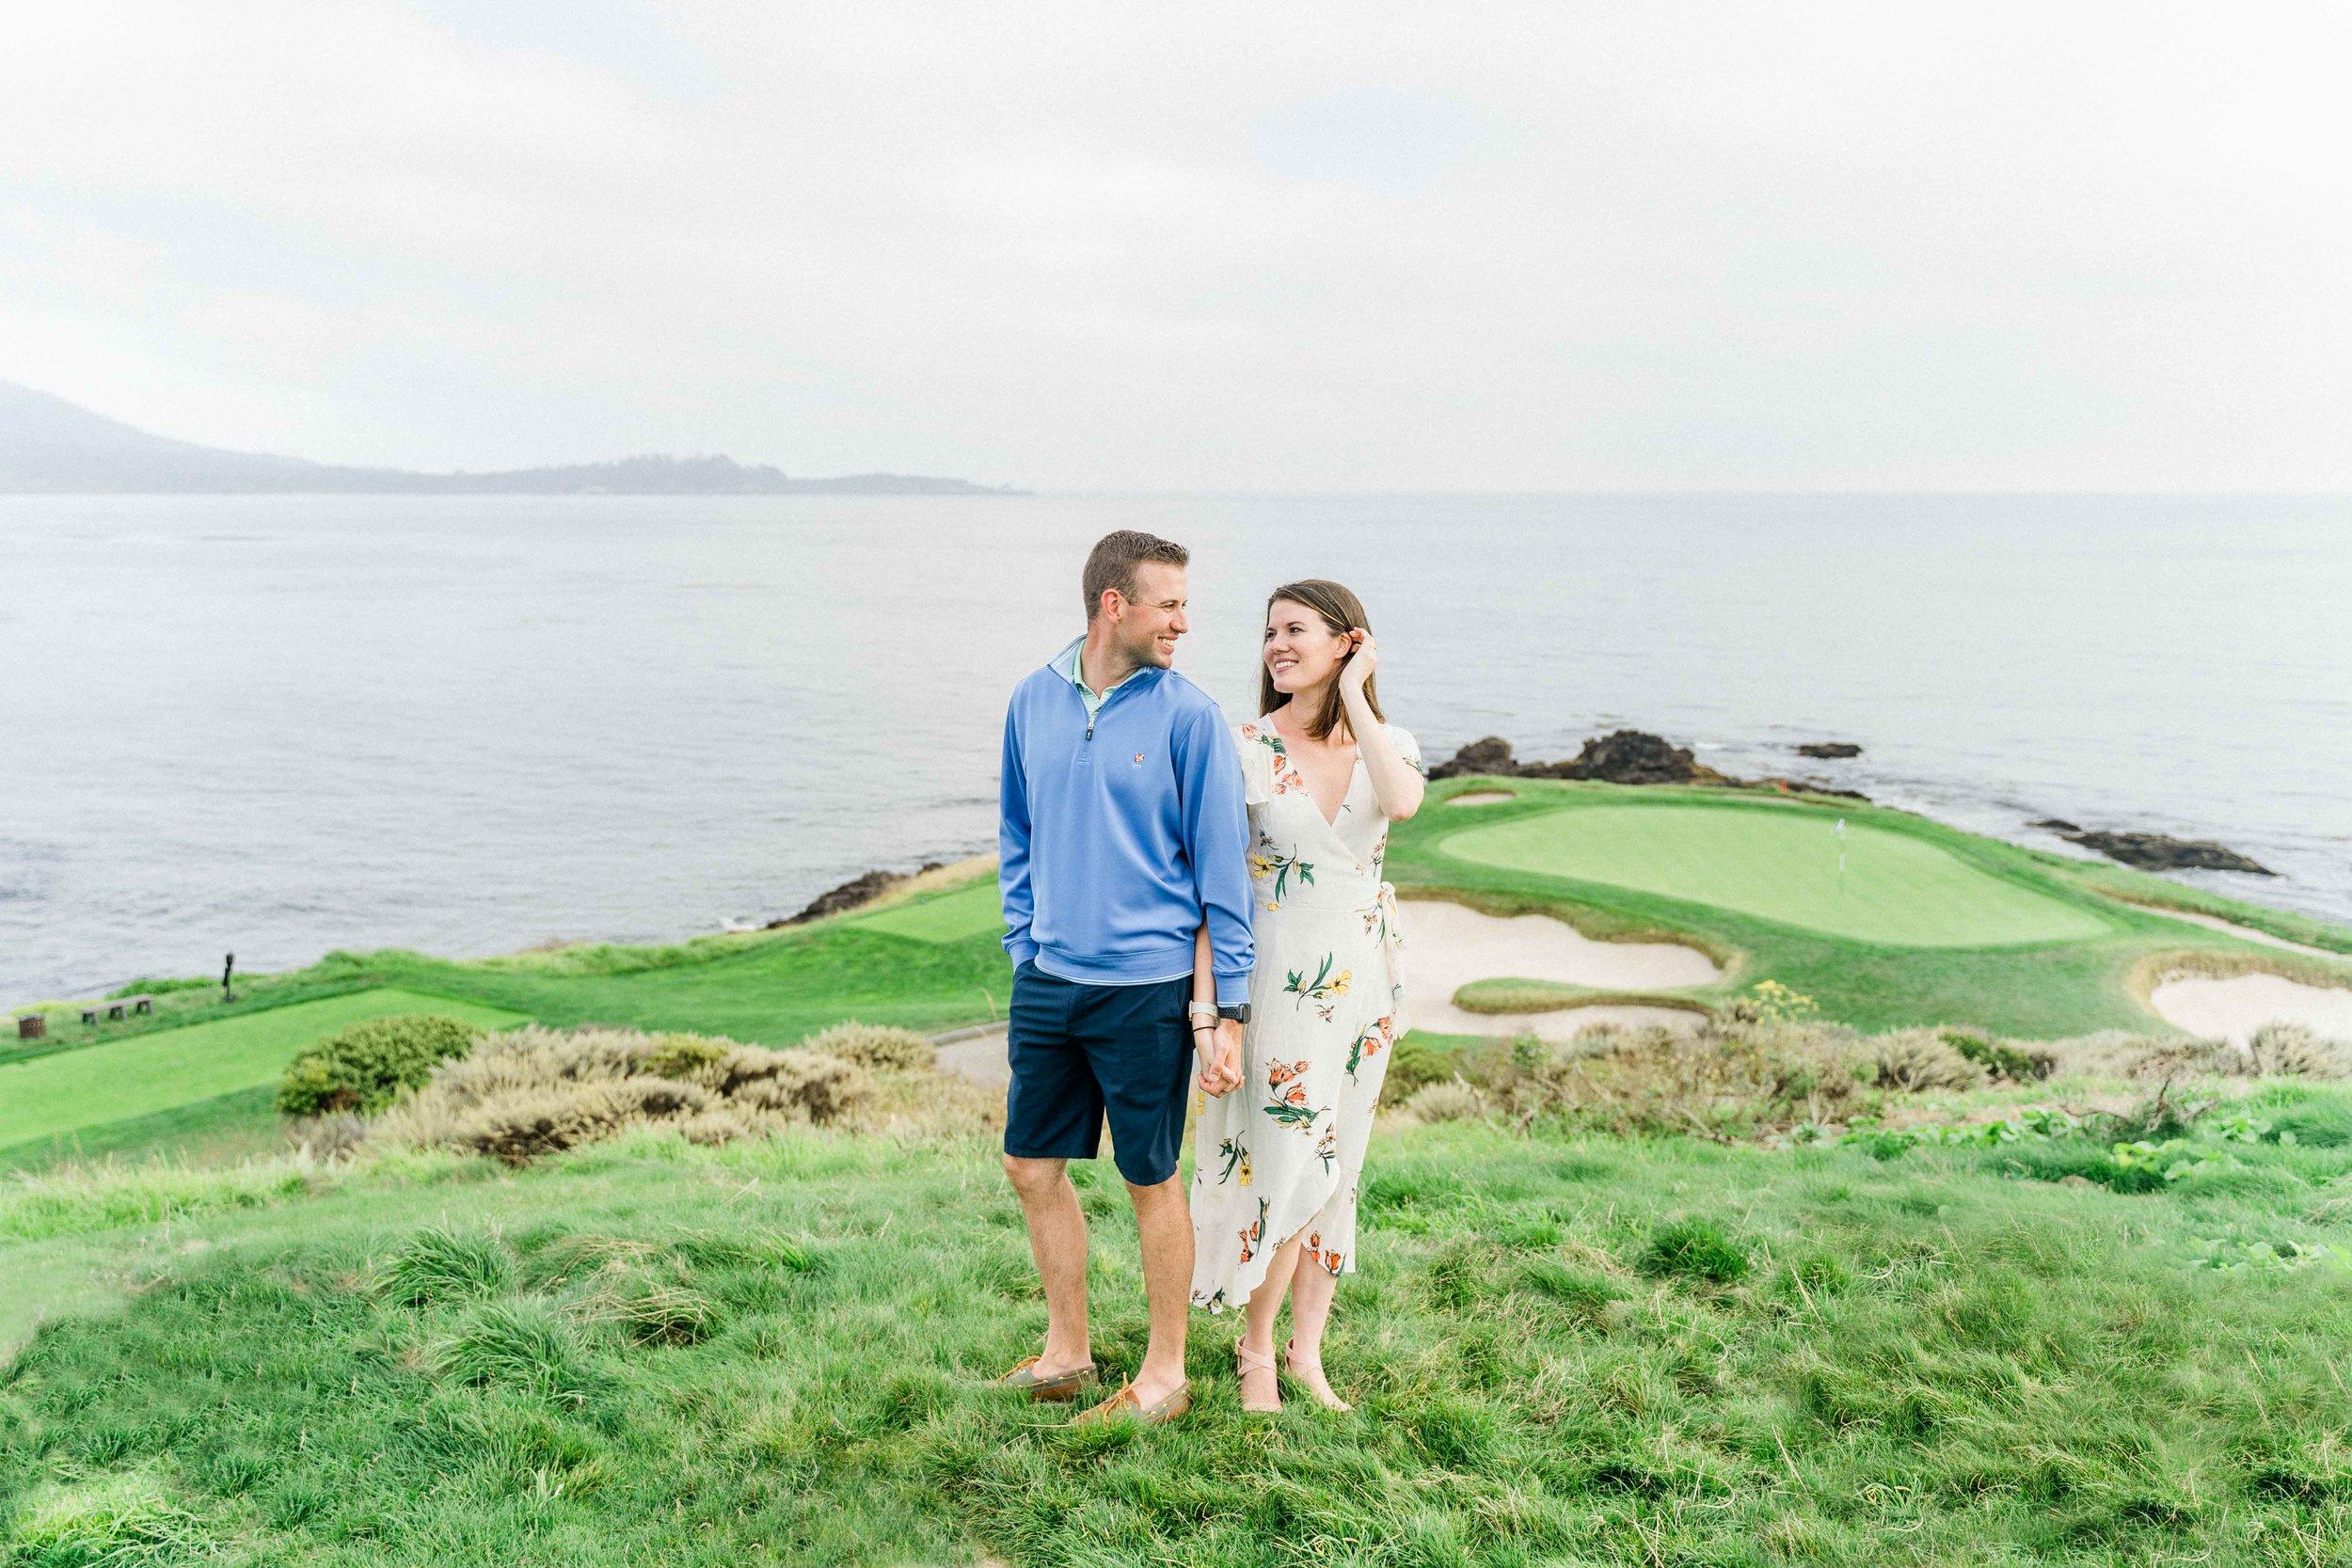 pebble-beach-golf-club-suprise-proposal-alex-kelsey-drew-zavala-photo-6.JPG